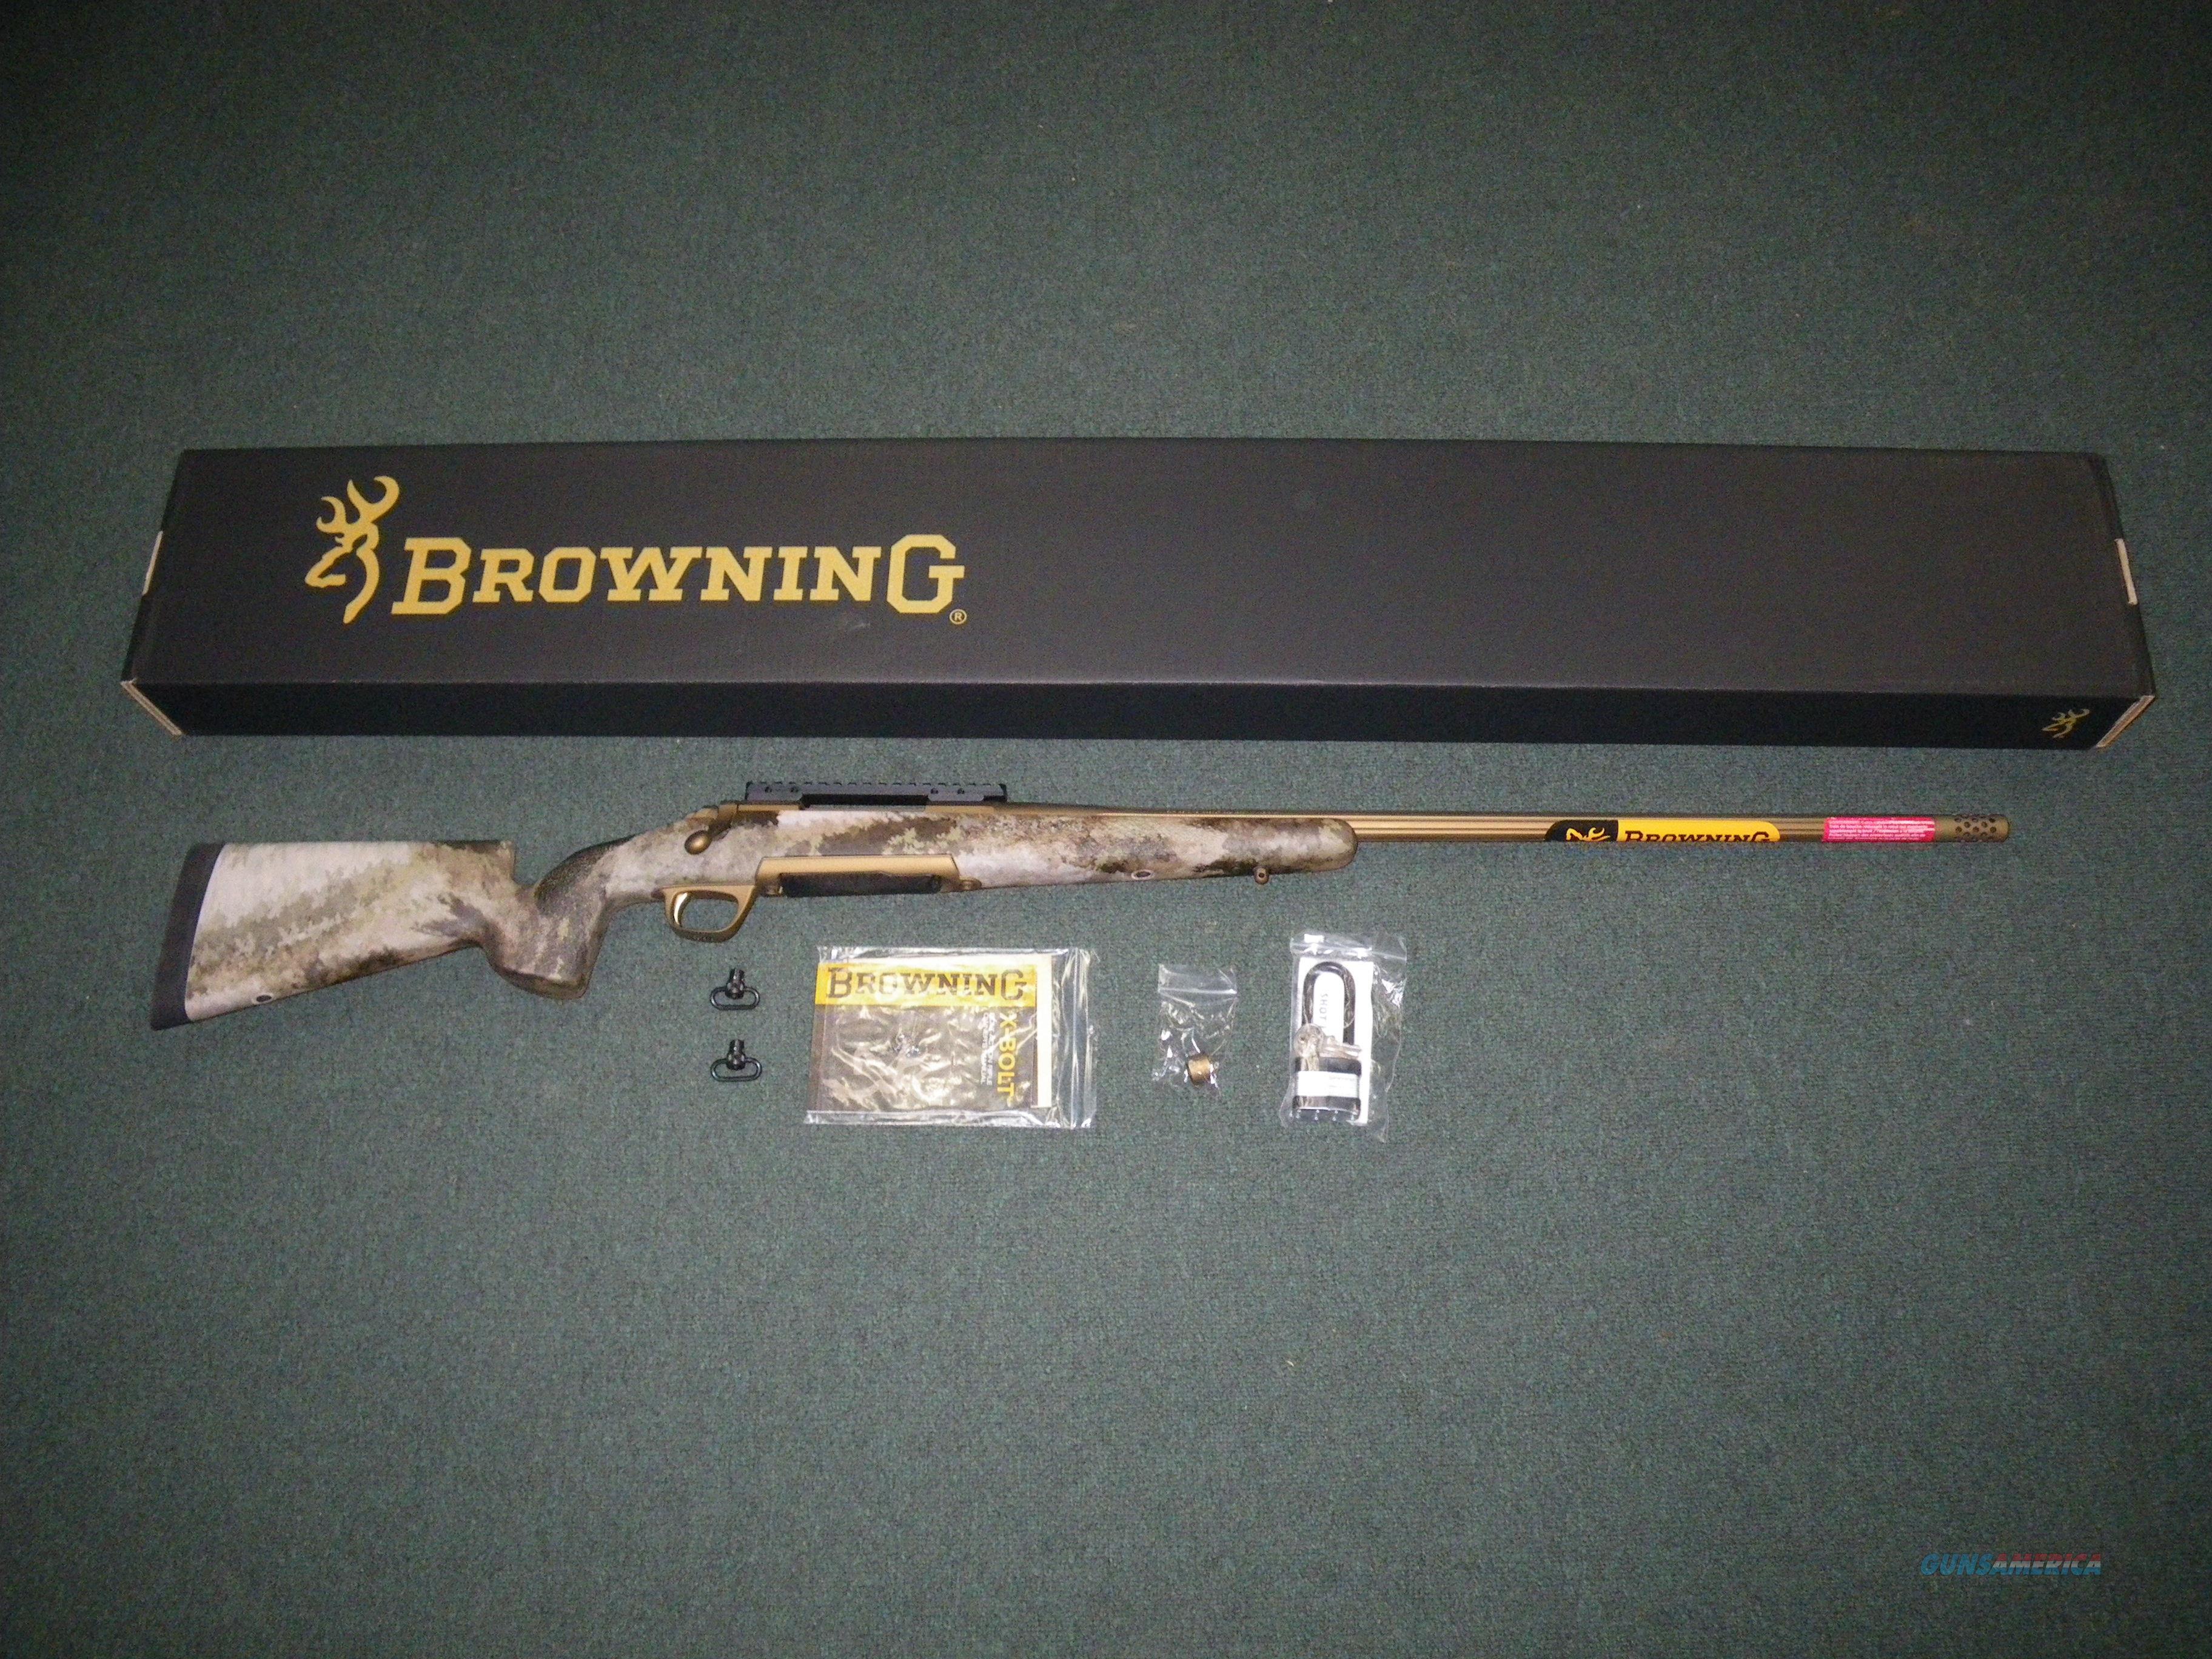 Browning X-Bolt Hells Canyon McMillan 26 Nosler NEW 035395287  Guns > Rifles > Browning Rifles > Bolt Action > Hunting > Blue